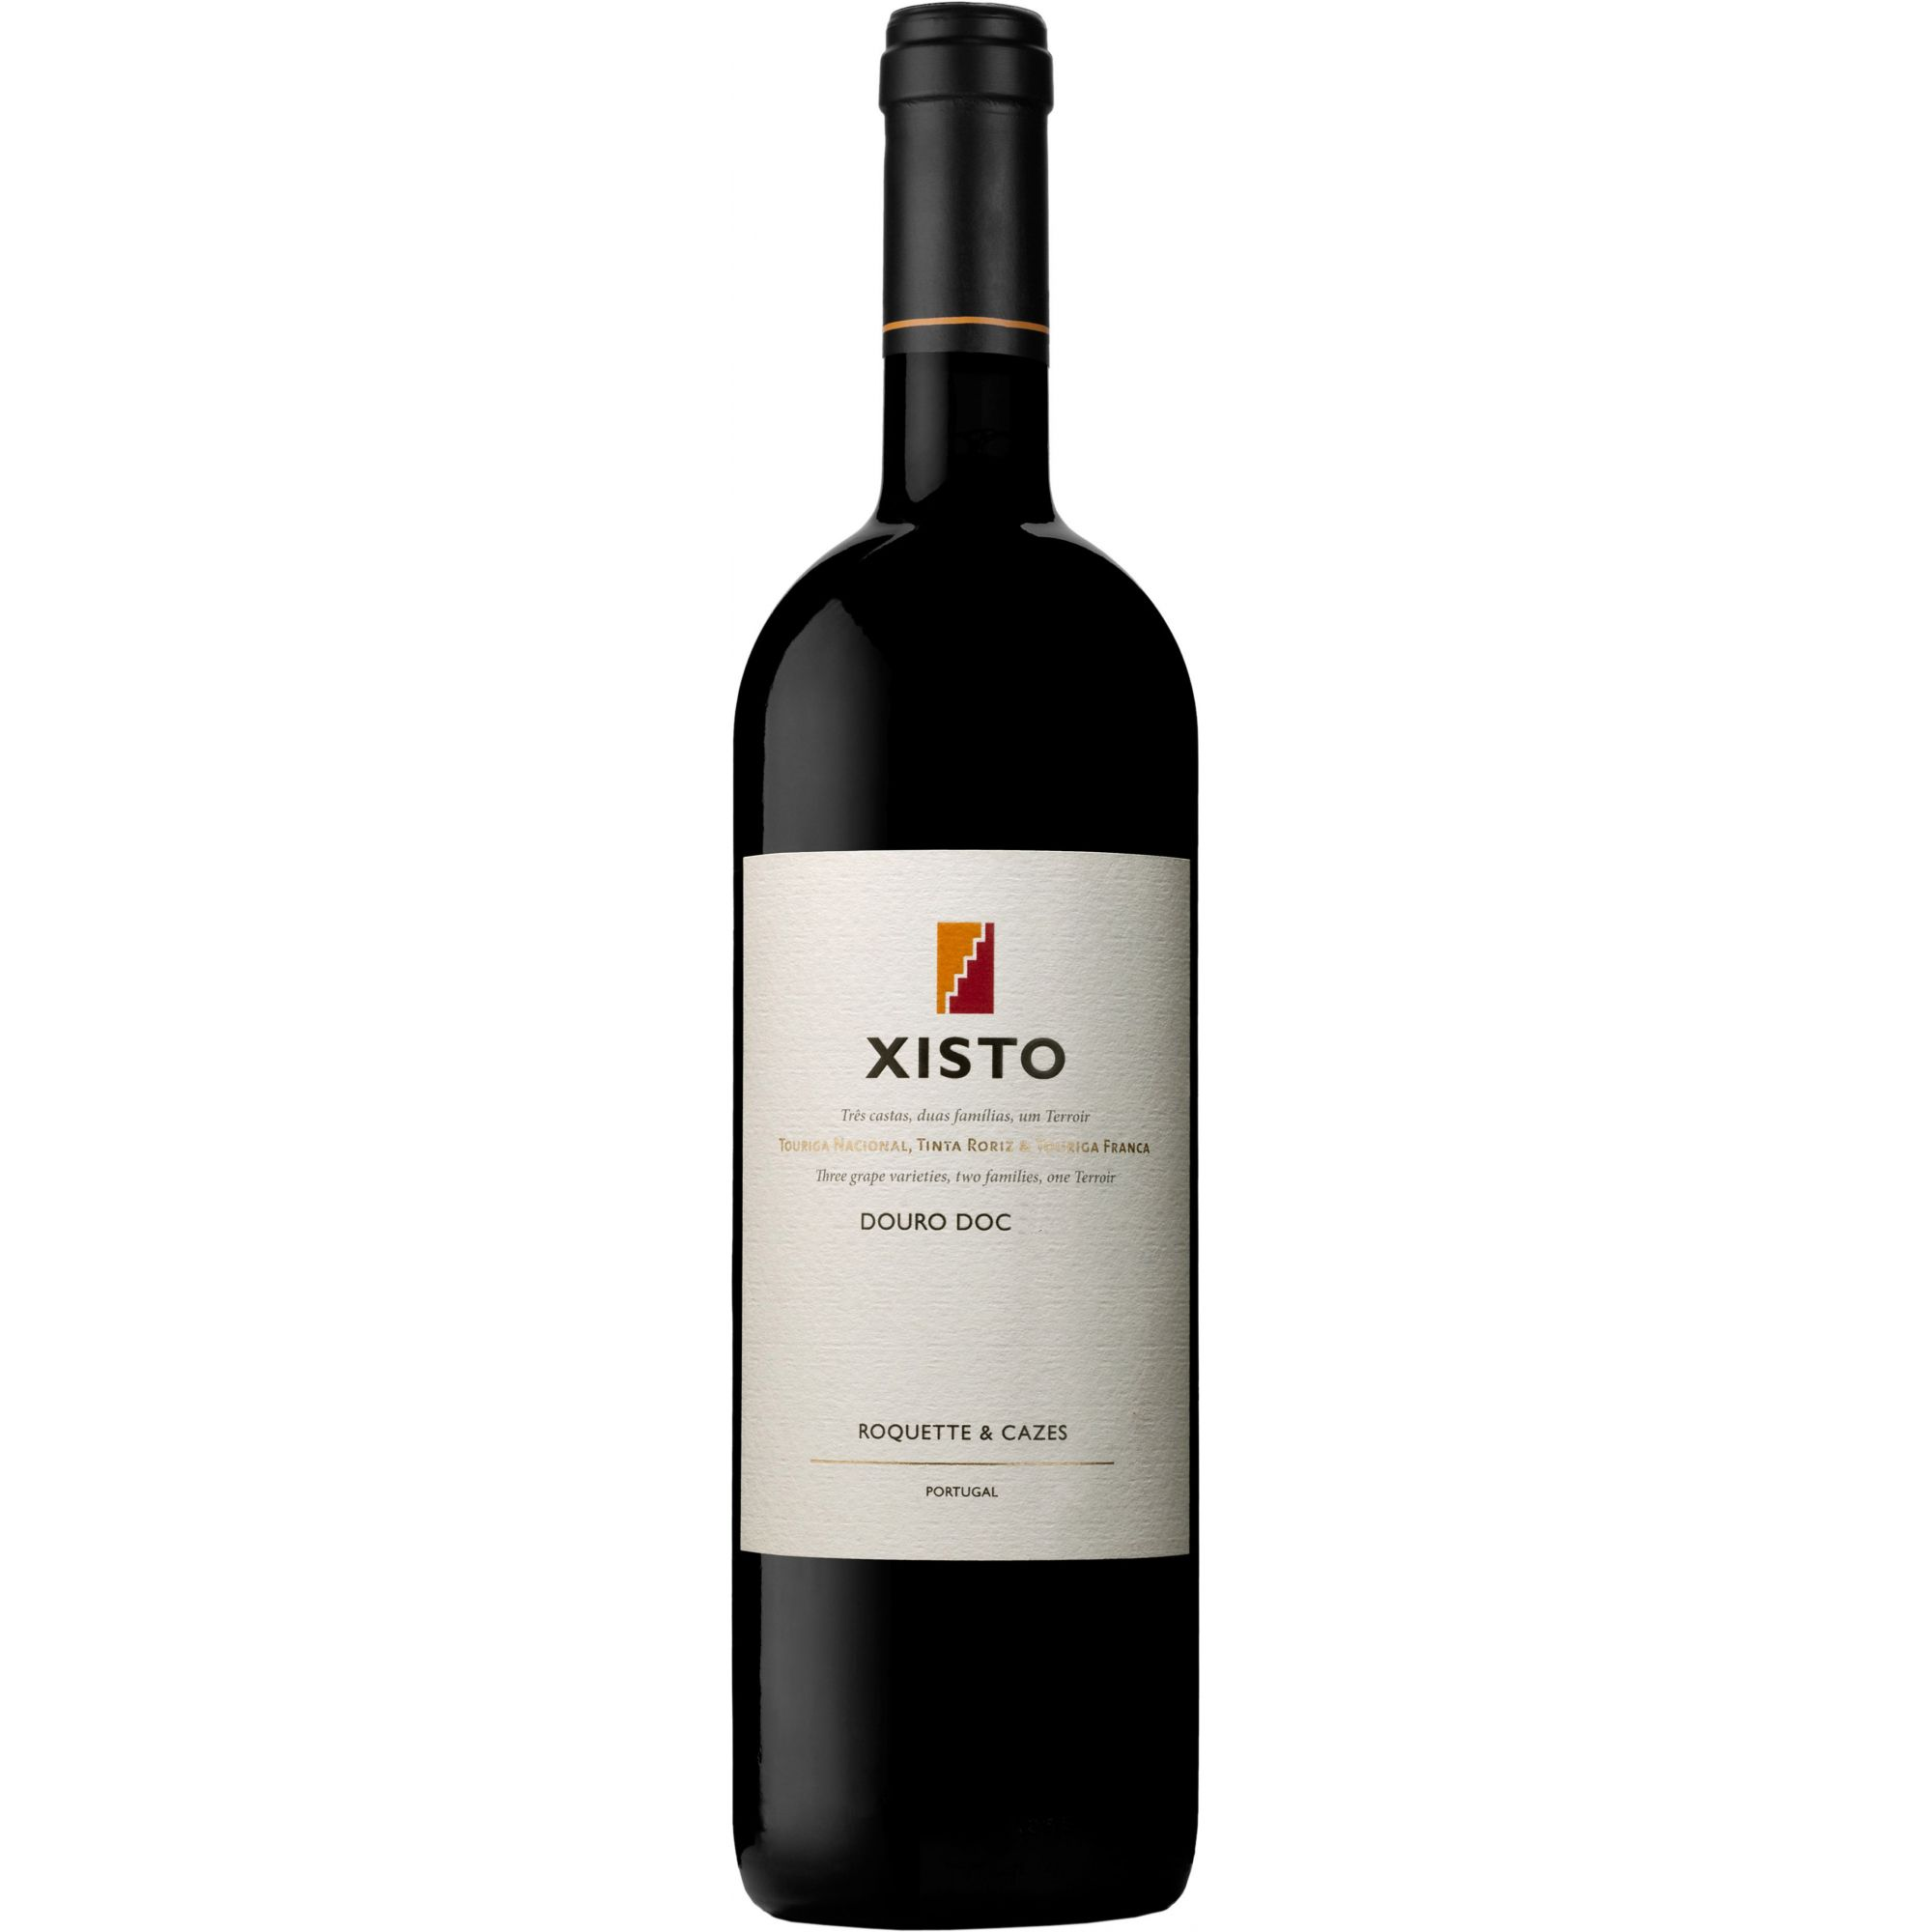 Vinho Xisto Roquette & Cazes Douro